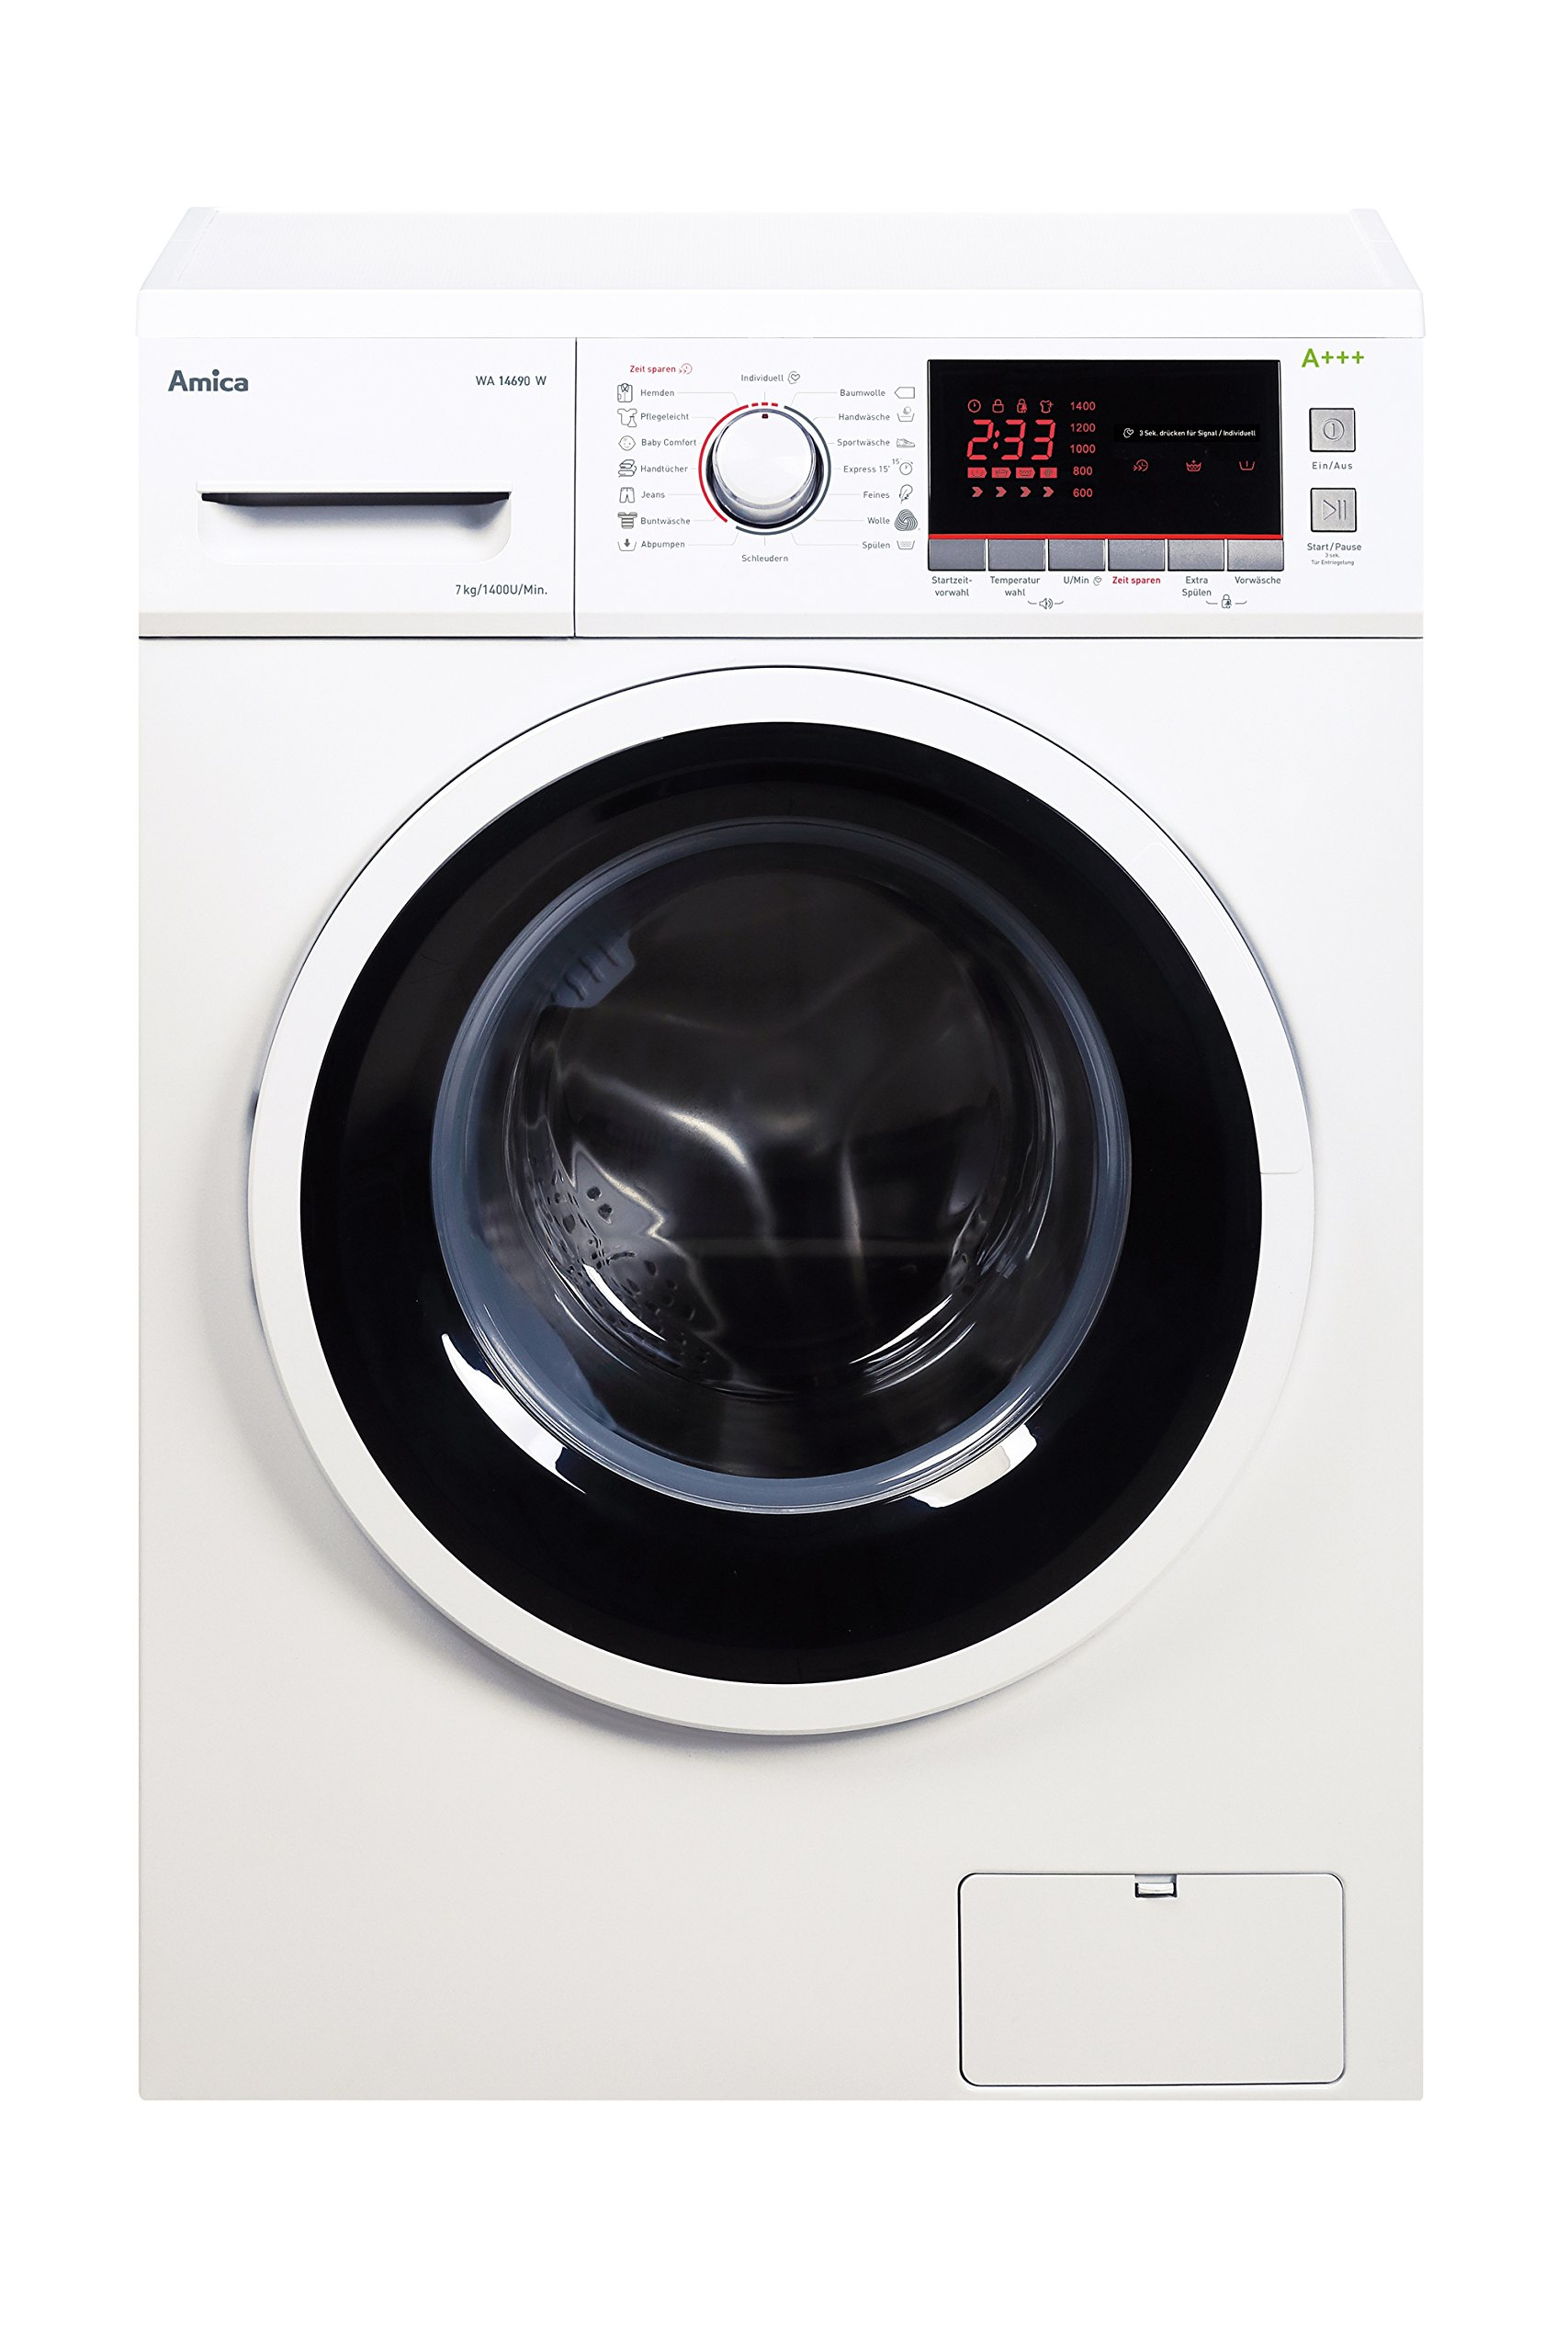 Amica-WA-14690-W-autonome-Belastung-Bevor-7-kg-1400trmin-A-Wei-Waschmaschine–Waschmaschinen-autonome-bevor-Belastung-wei-links-LED-Rot